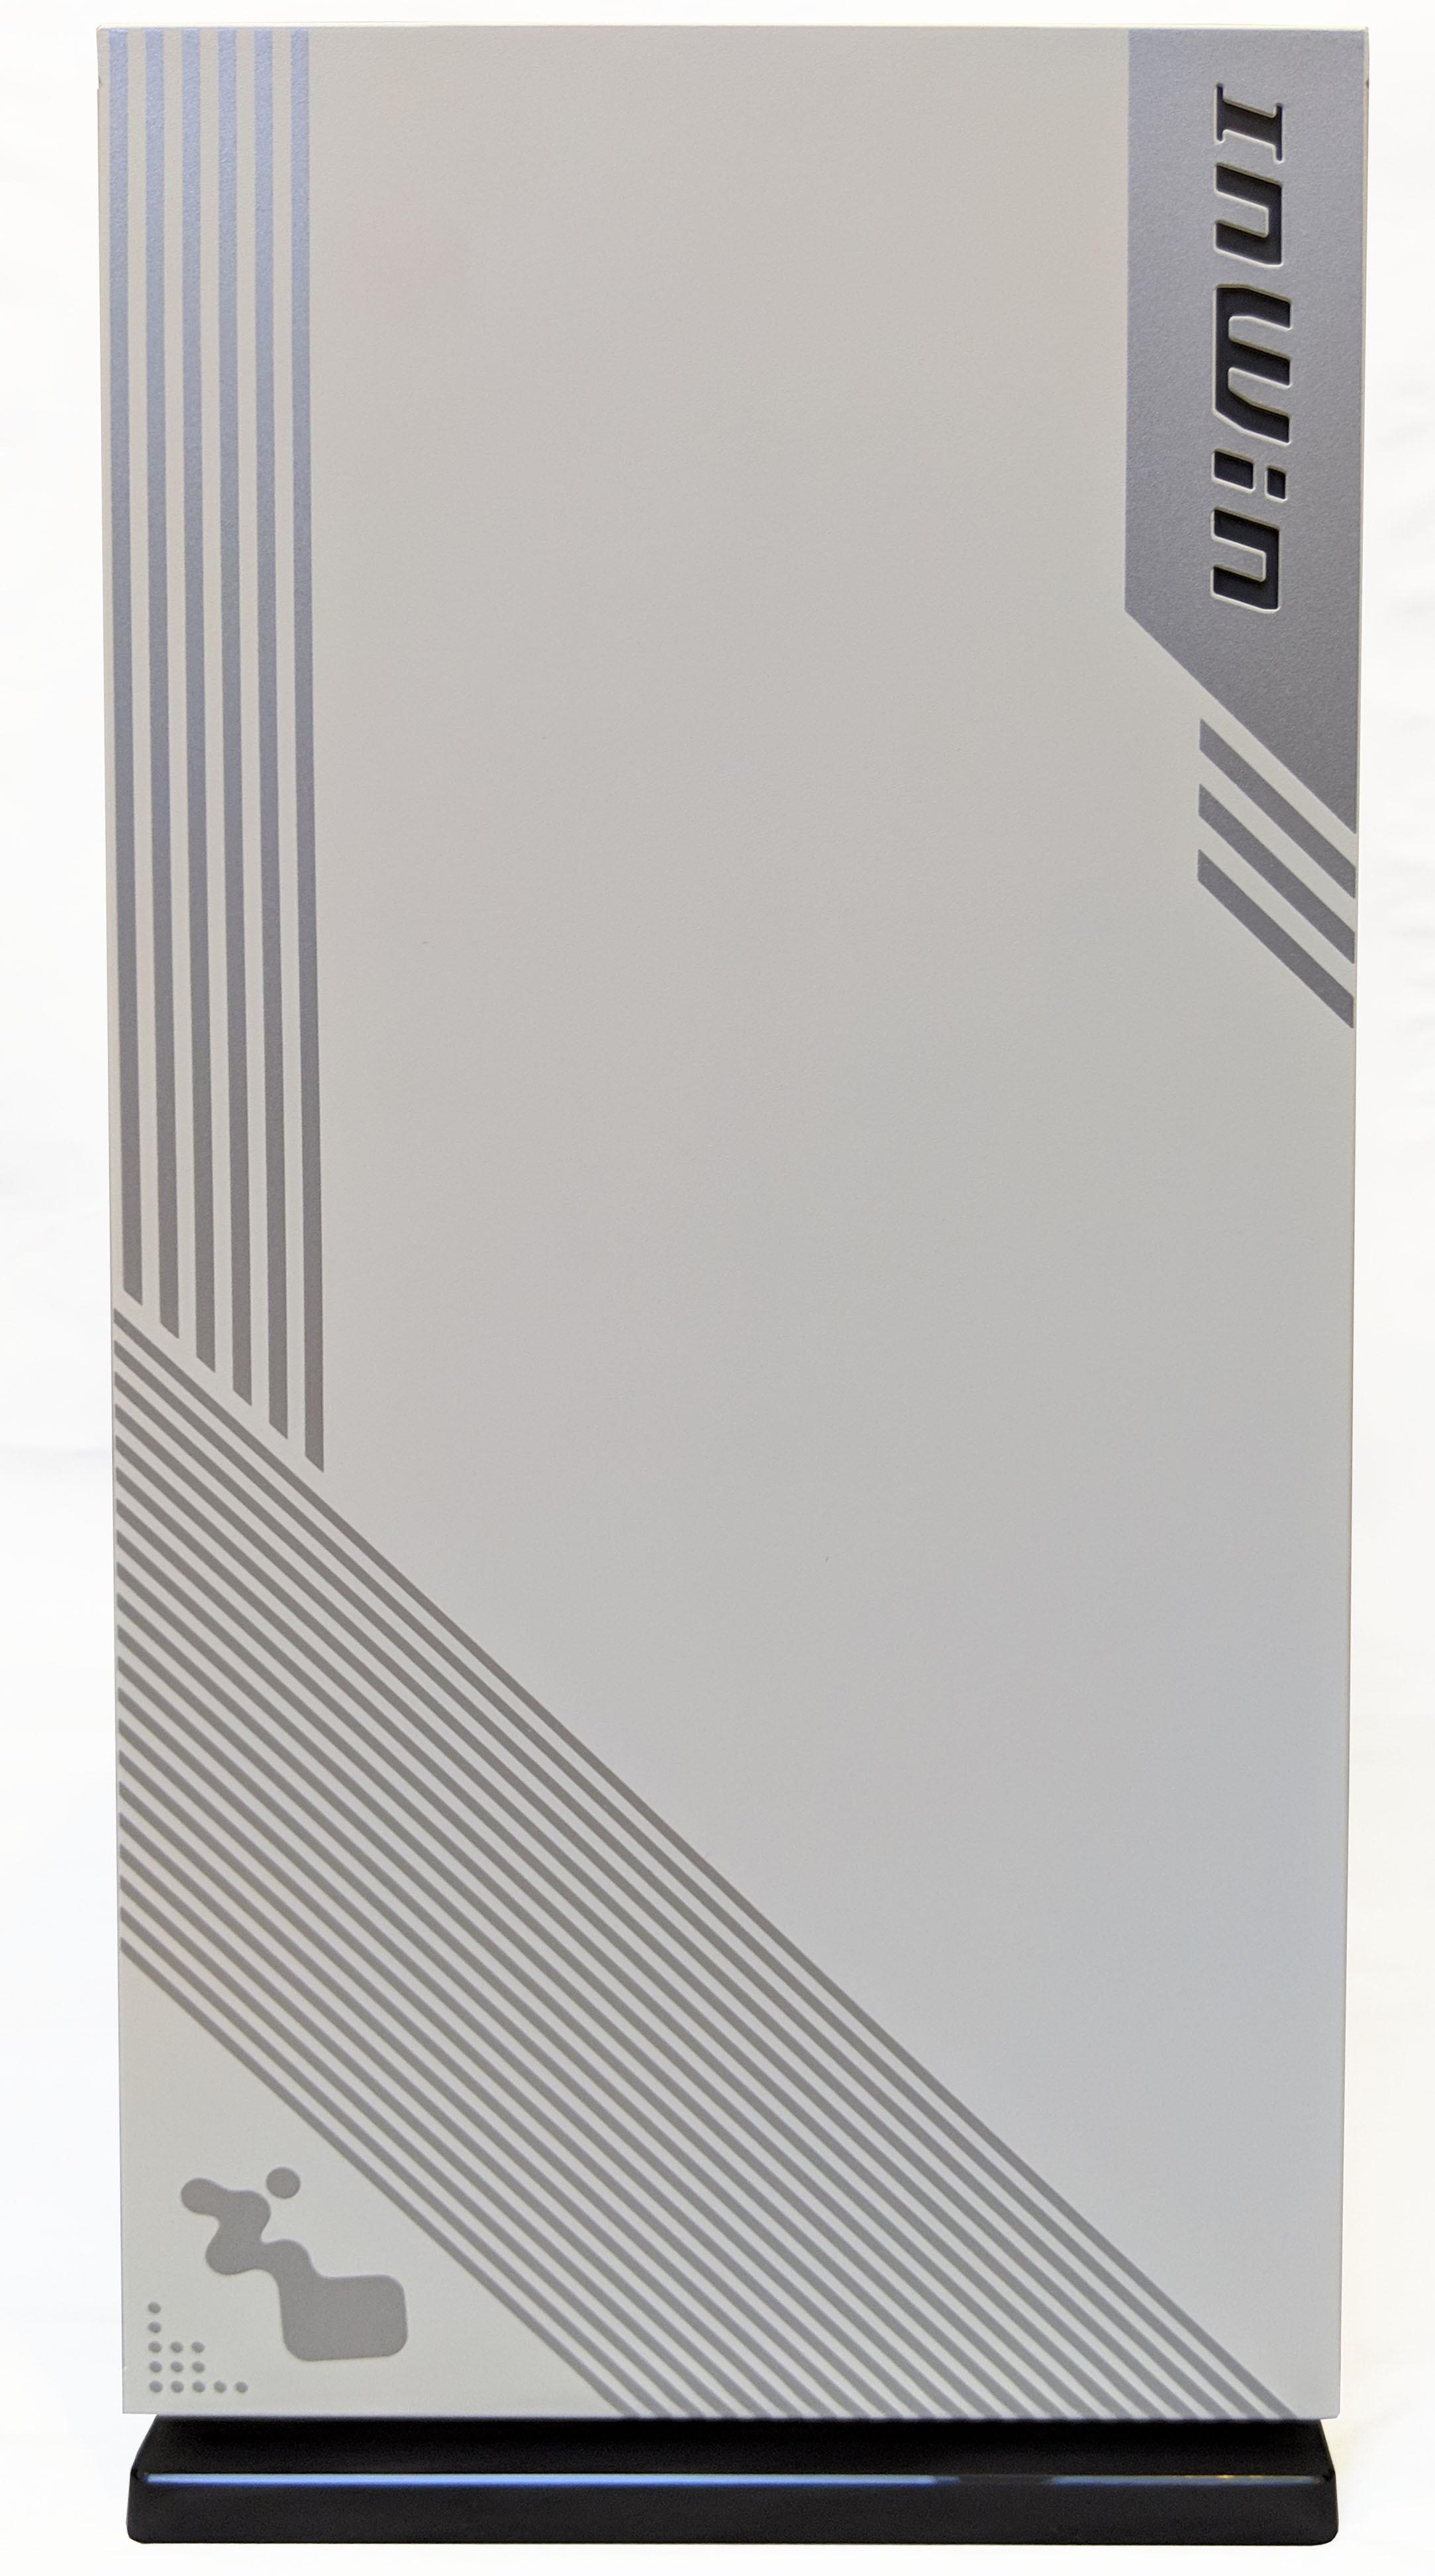 Inwin 103 White Pc Case Review Gnd Tech